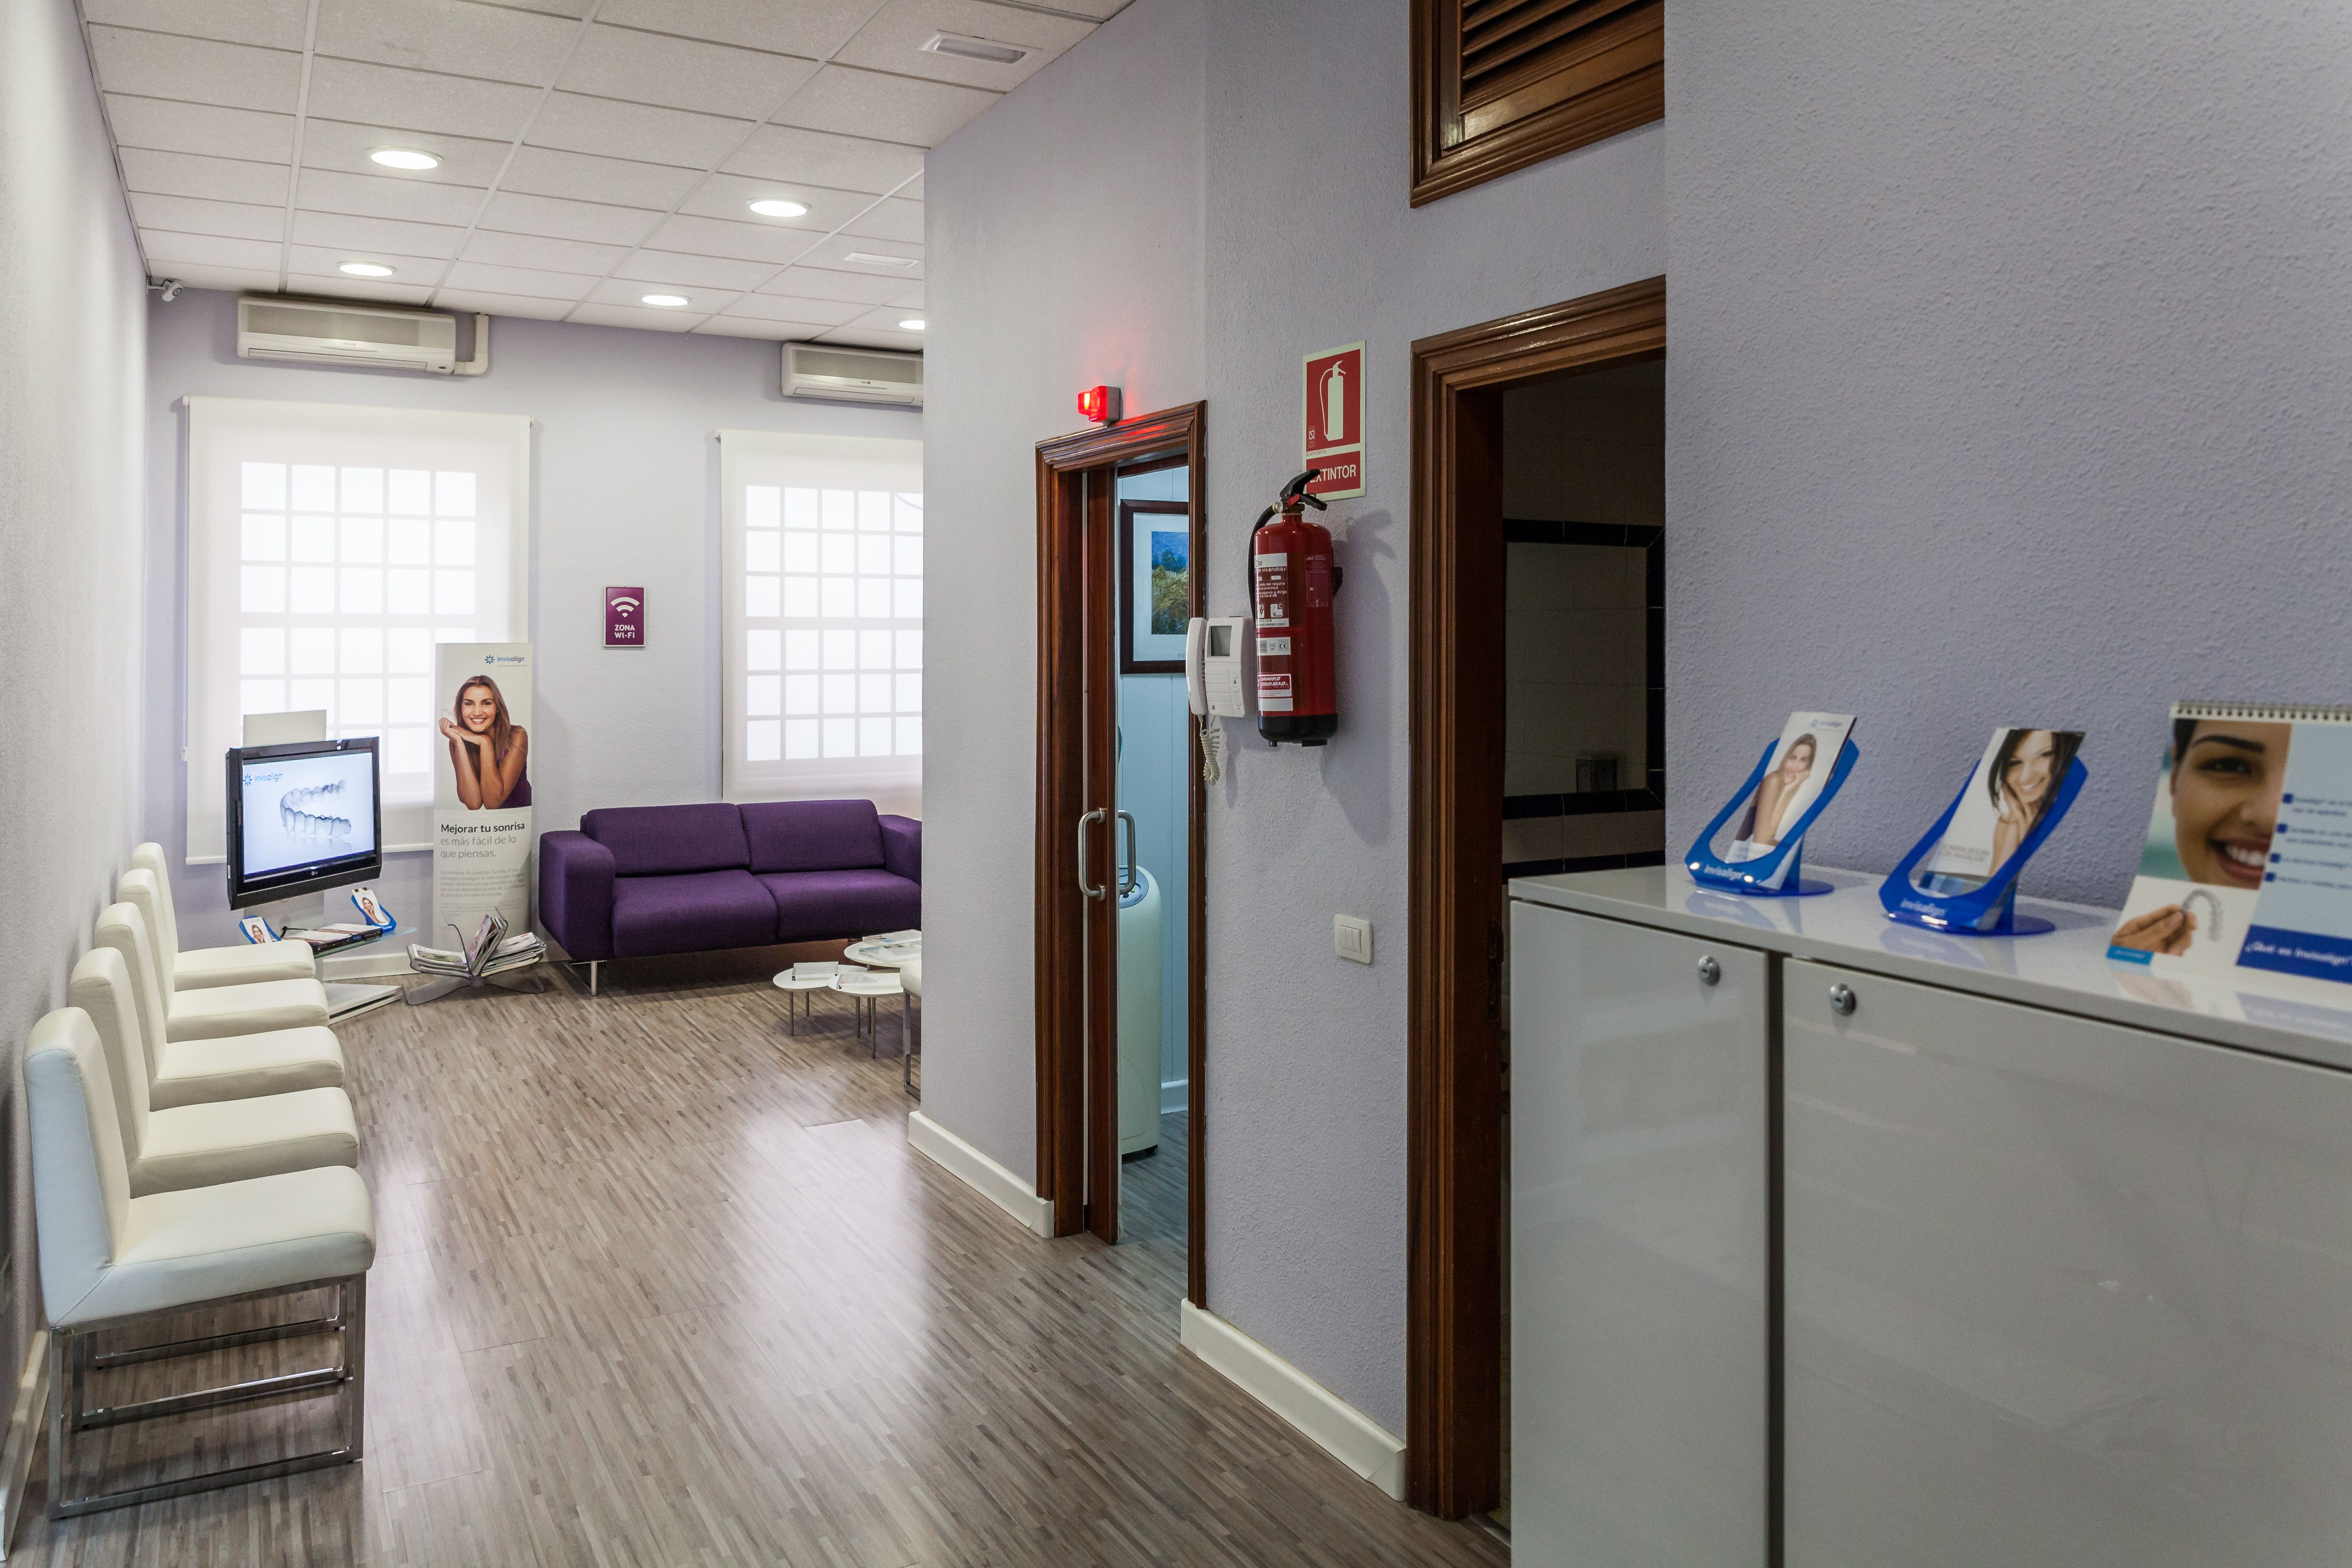 Foto 10 de Clínicas dentales en San Cristobal de la Laguna | DR. JAVIER DE LORENZO-CÁCERES CULLEN